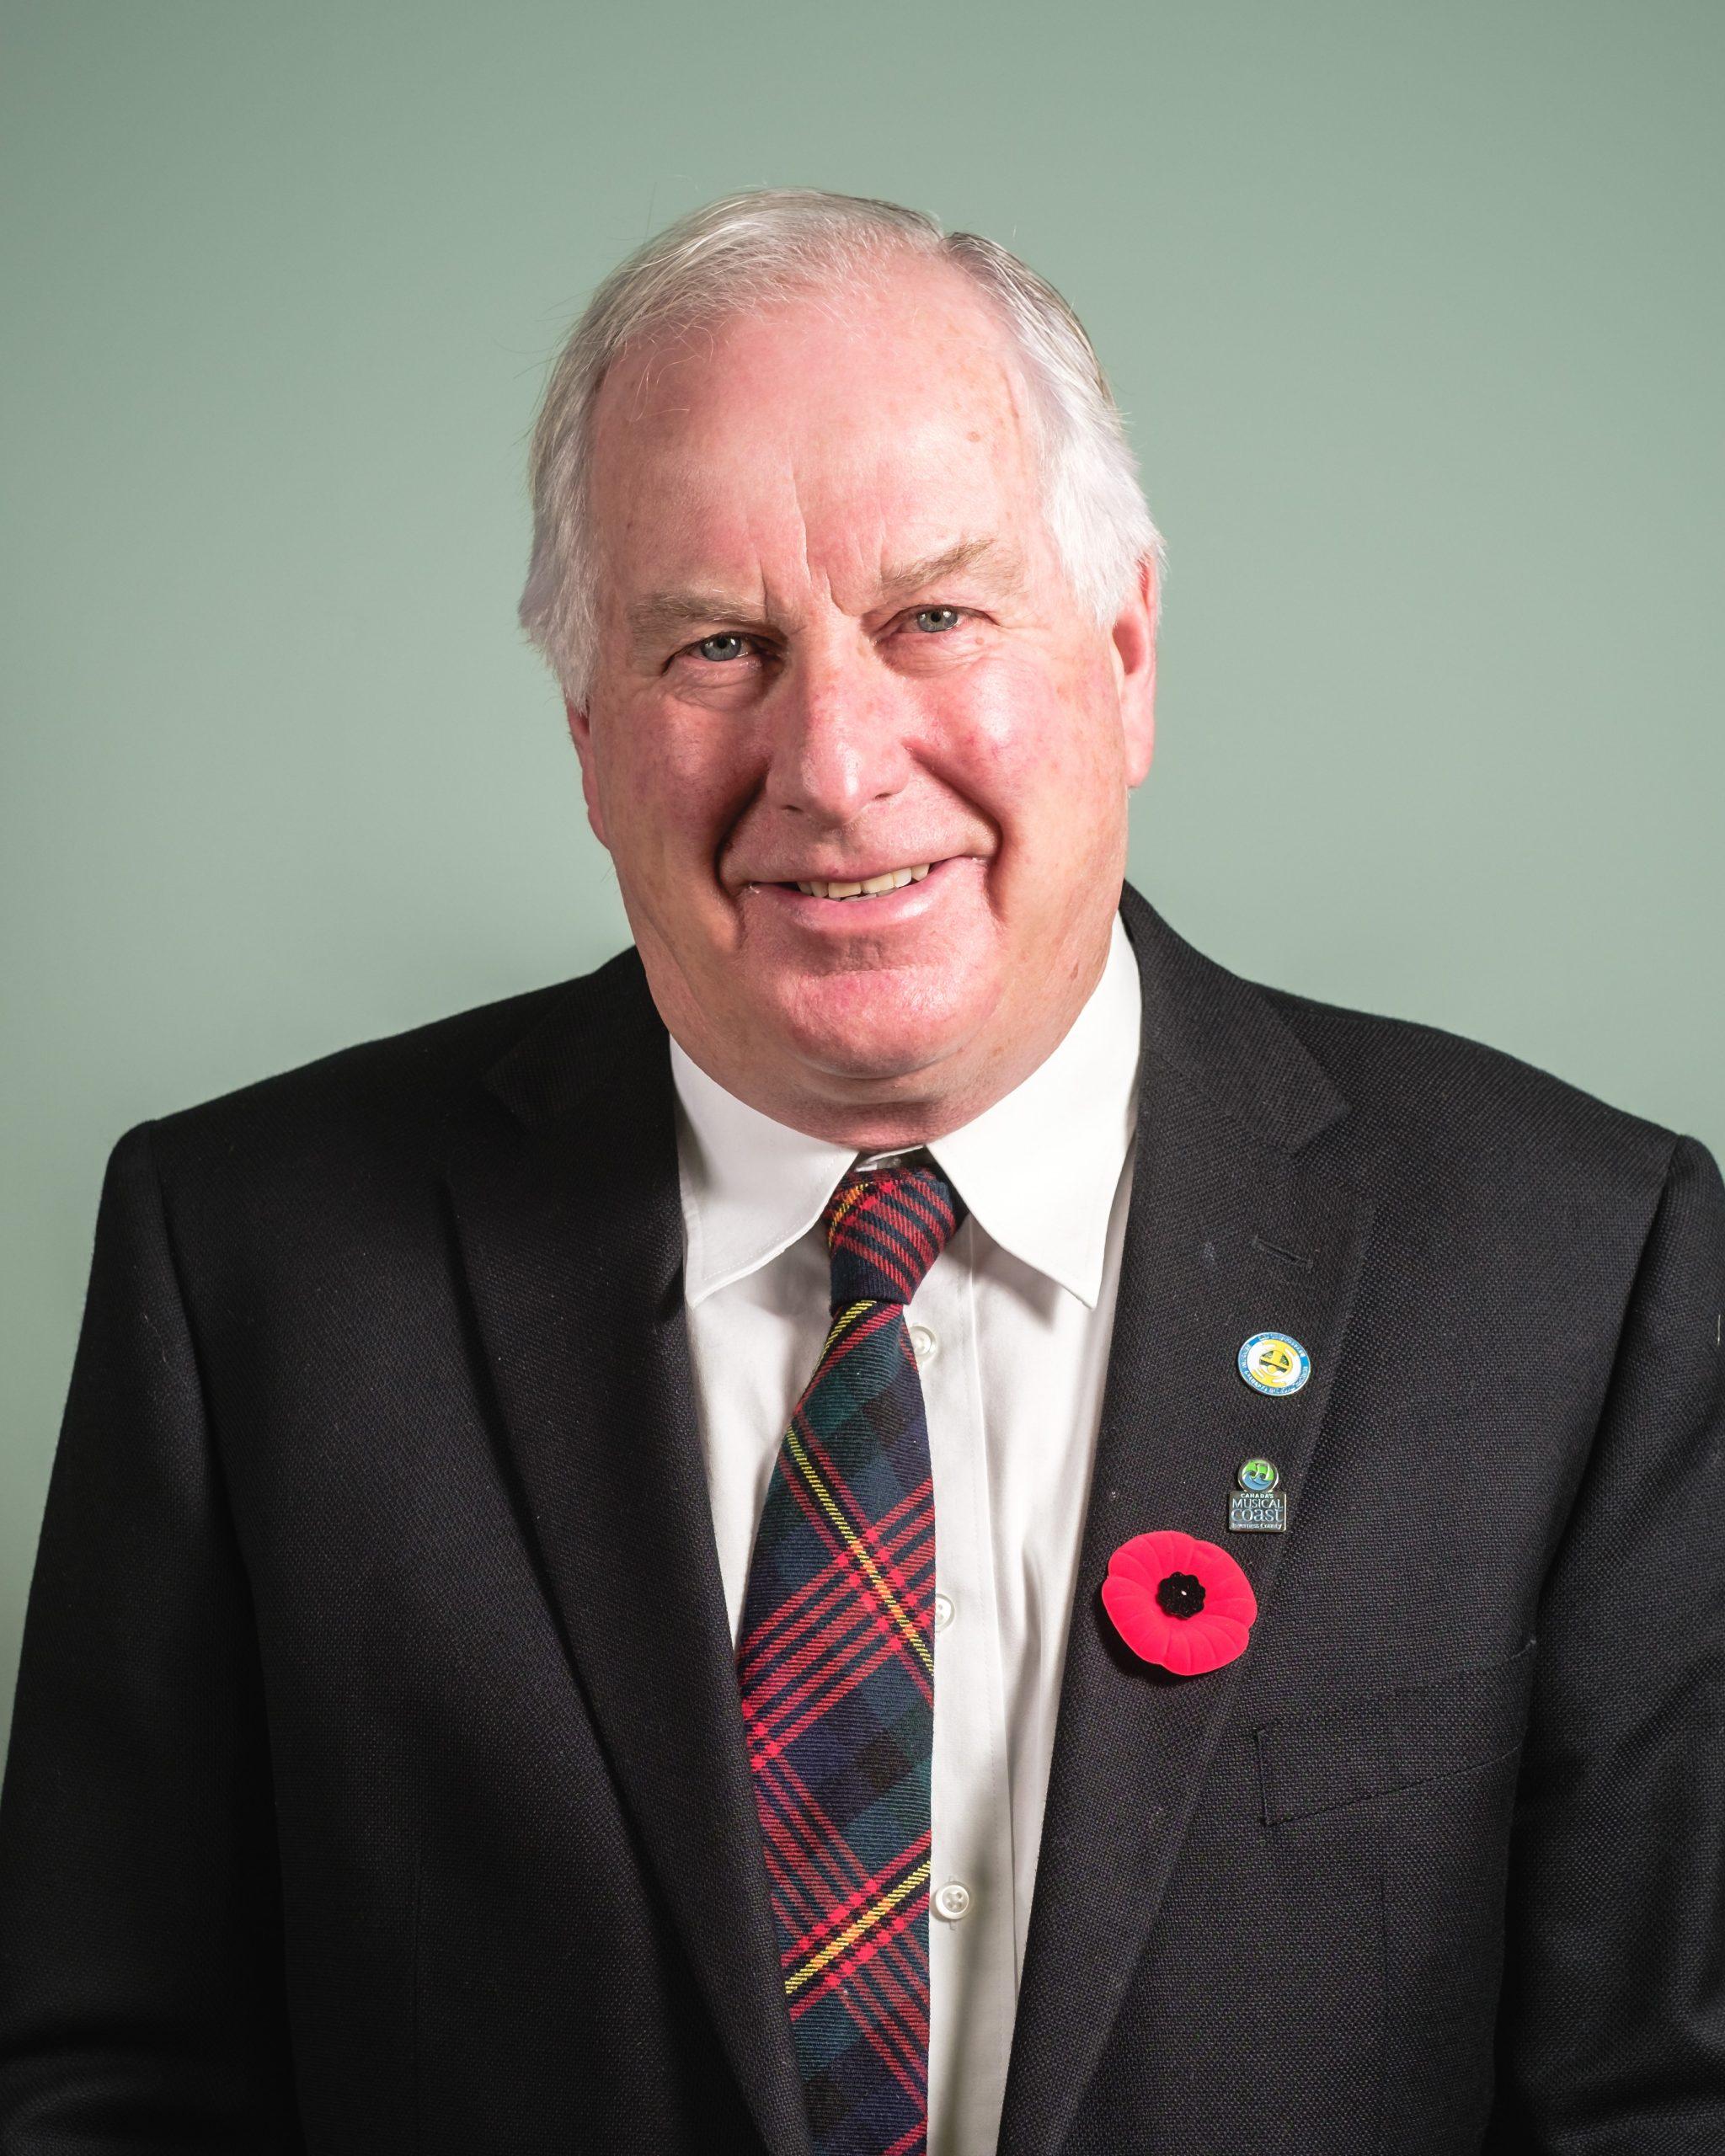 Councillor John MacLennan